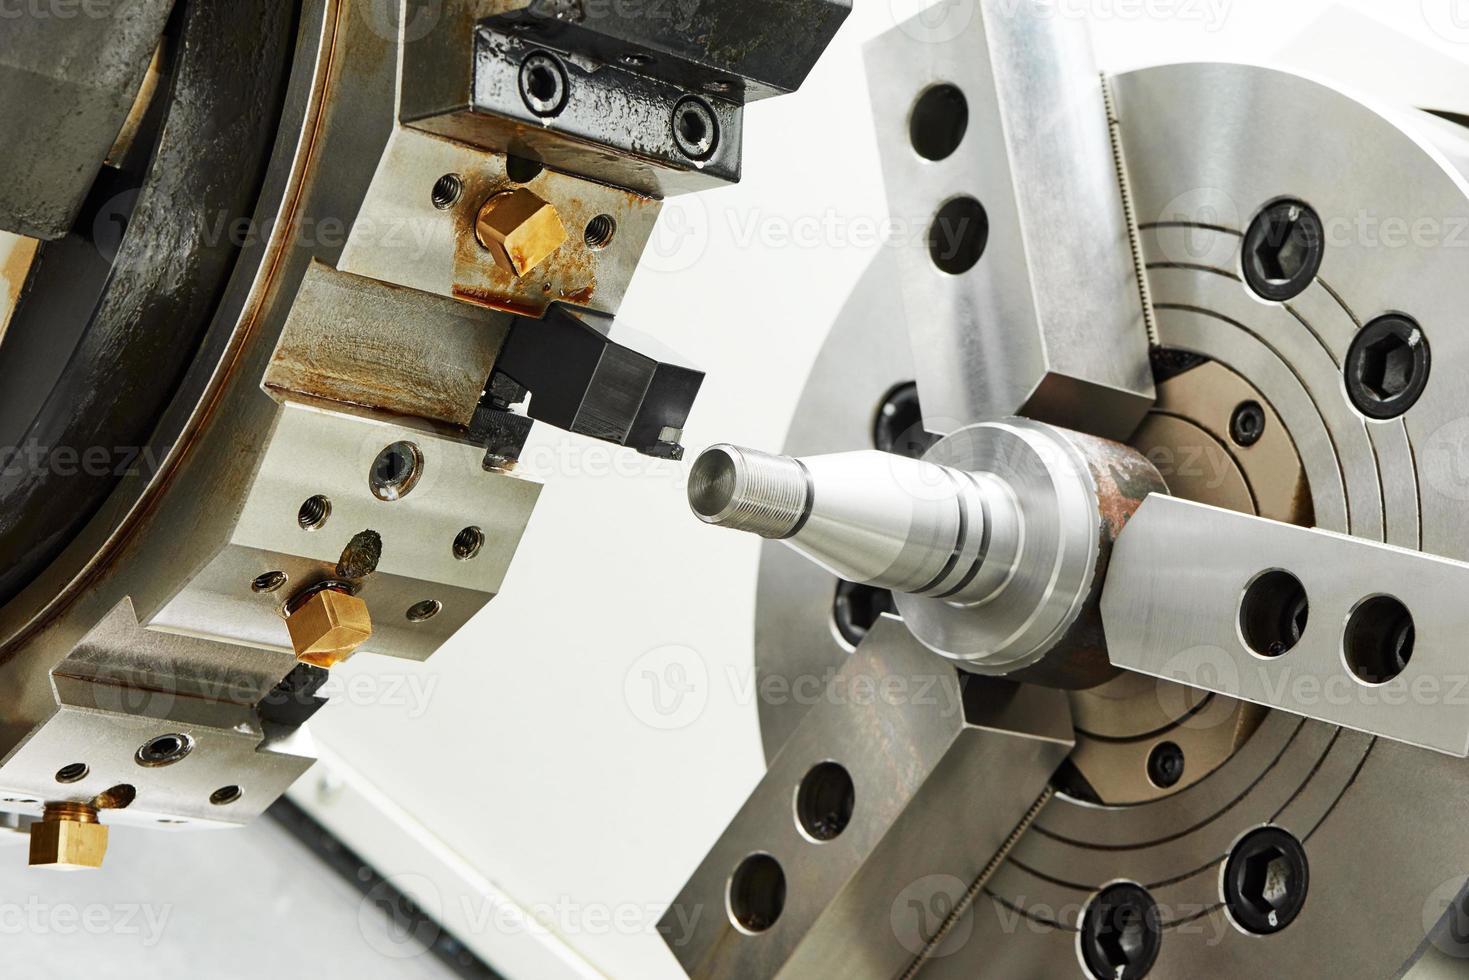 metalworking turning process photo